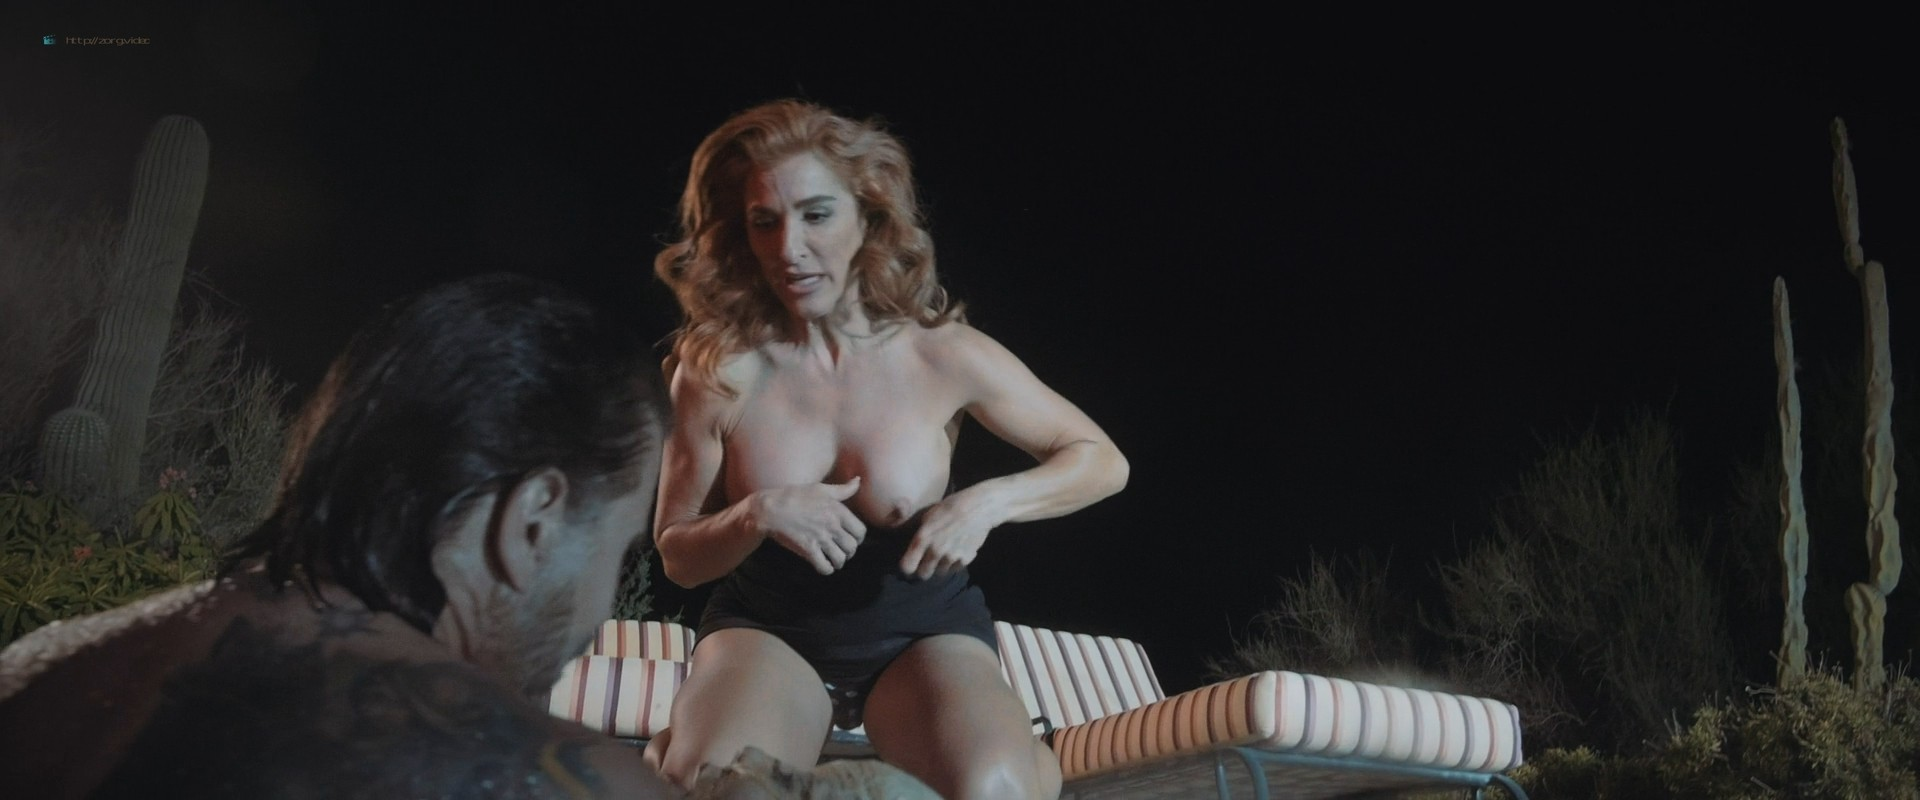 Audrey Beth nude topless Kier Simonetta, Michelle Miller nude too - Water (2019) 1080p (6)